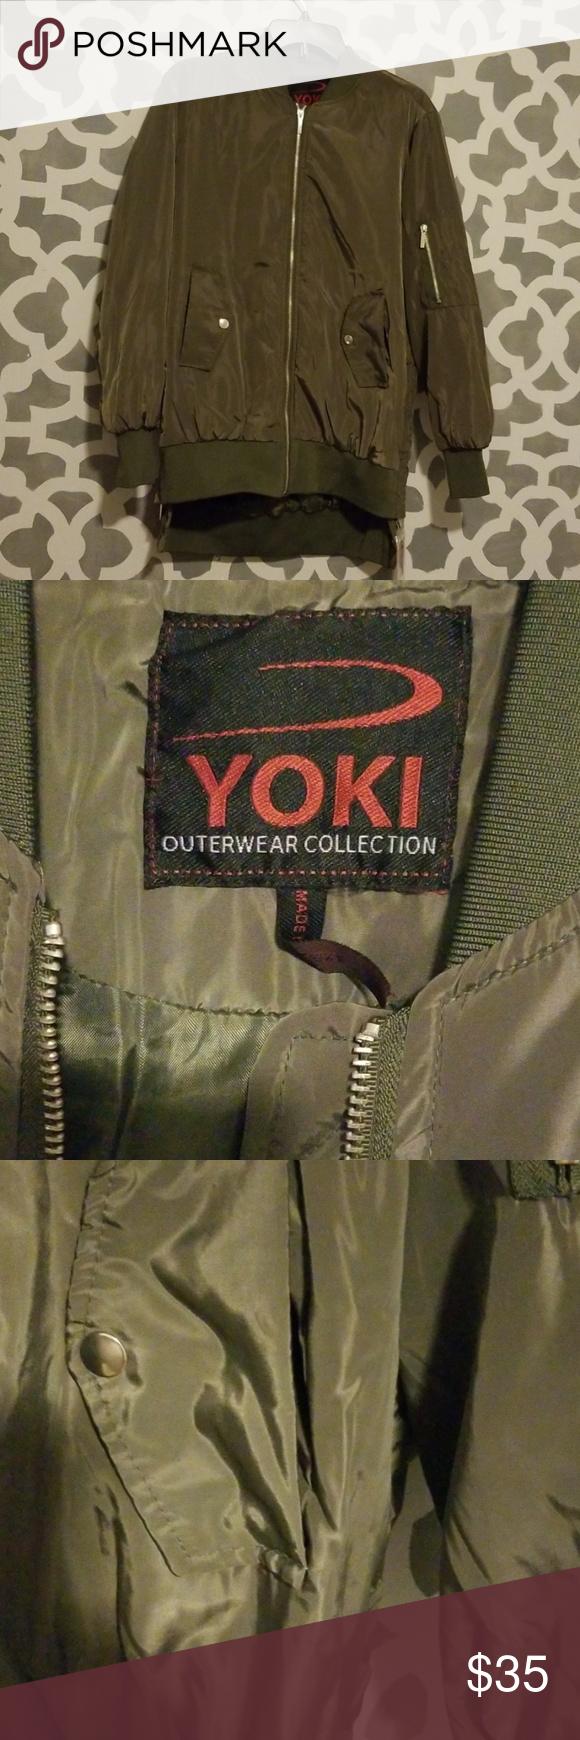 Yoki Outerwear Jacket Olive Lightweight Jacket By Yoki 2 Front Pockets And One Pocket On The Sleeve Nwt Medium Yoki Jackets Co Jackets Outerwear Jackets Yoki [ 1740 x 580 Pixel ]